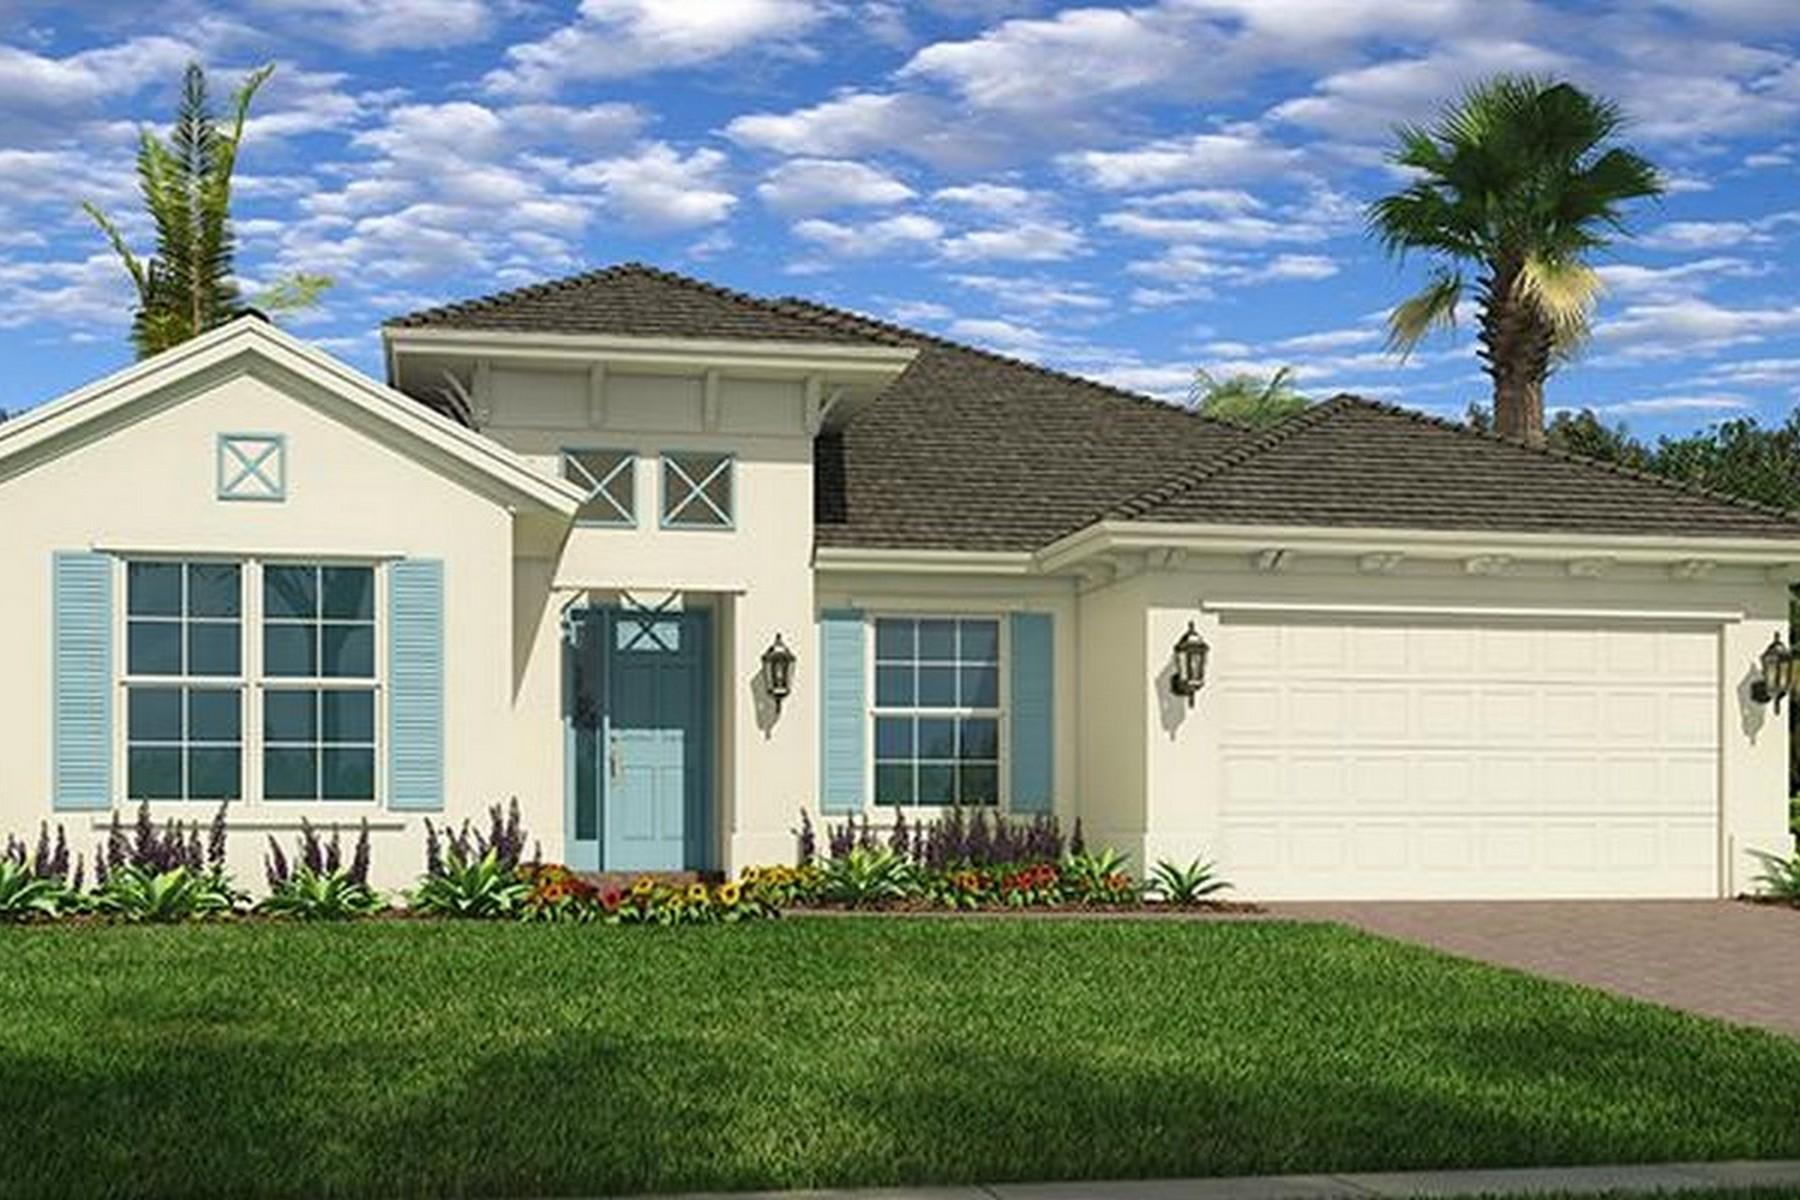 Nhà ở một gia đình vì Bán tại One of our Newest Models in the Beautiful Community of Lily's Cay 1371 Lily's Cay Circle Vero Beach, Florida, 32967 Hoa Kỳ